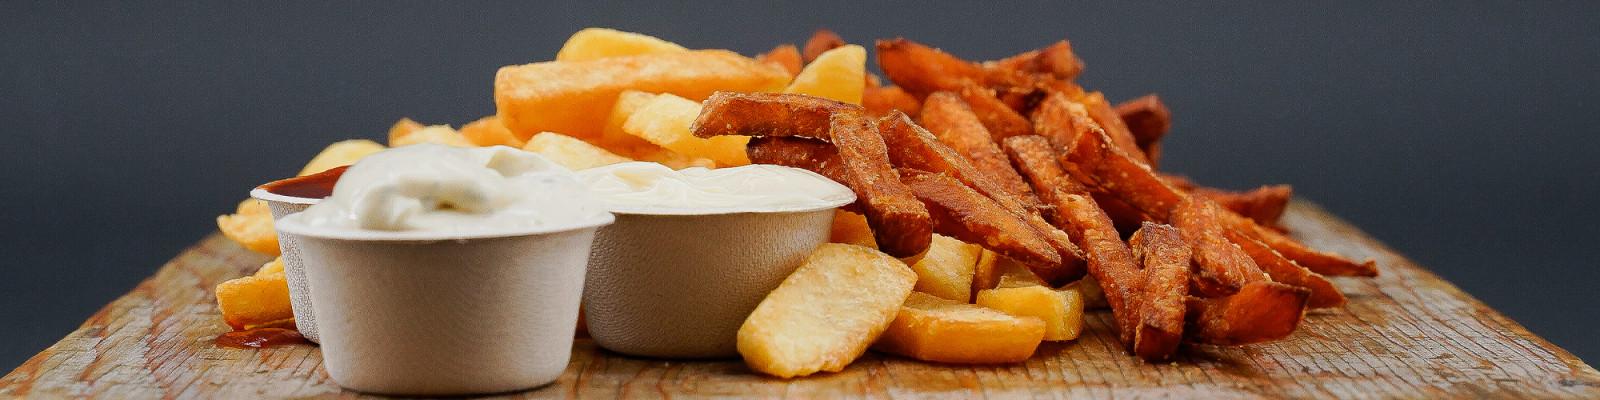 Piwy's Burger Warengruppenbild